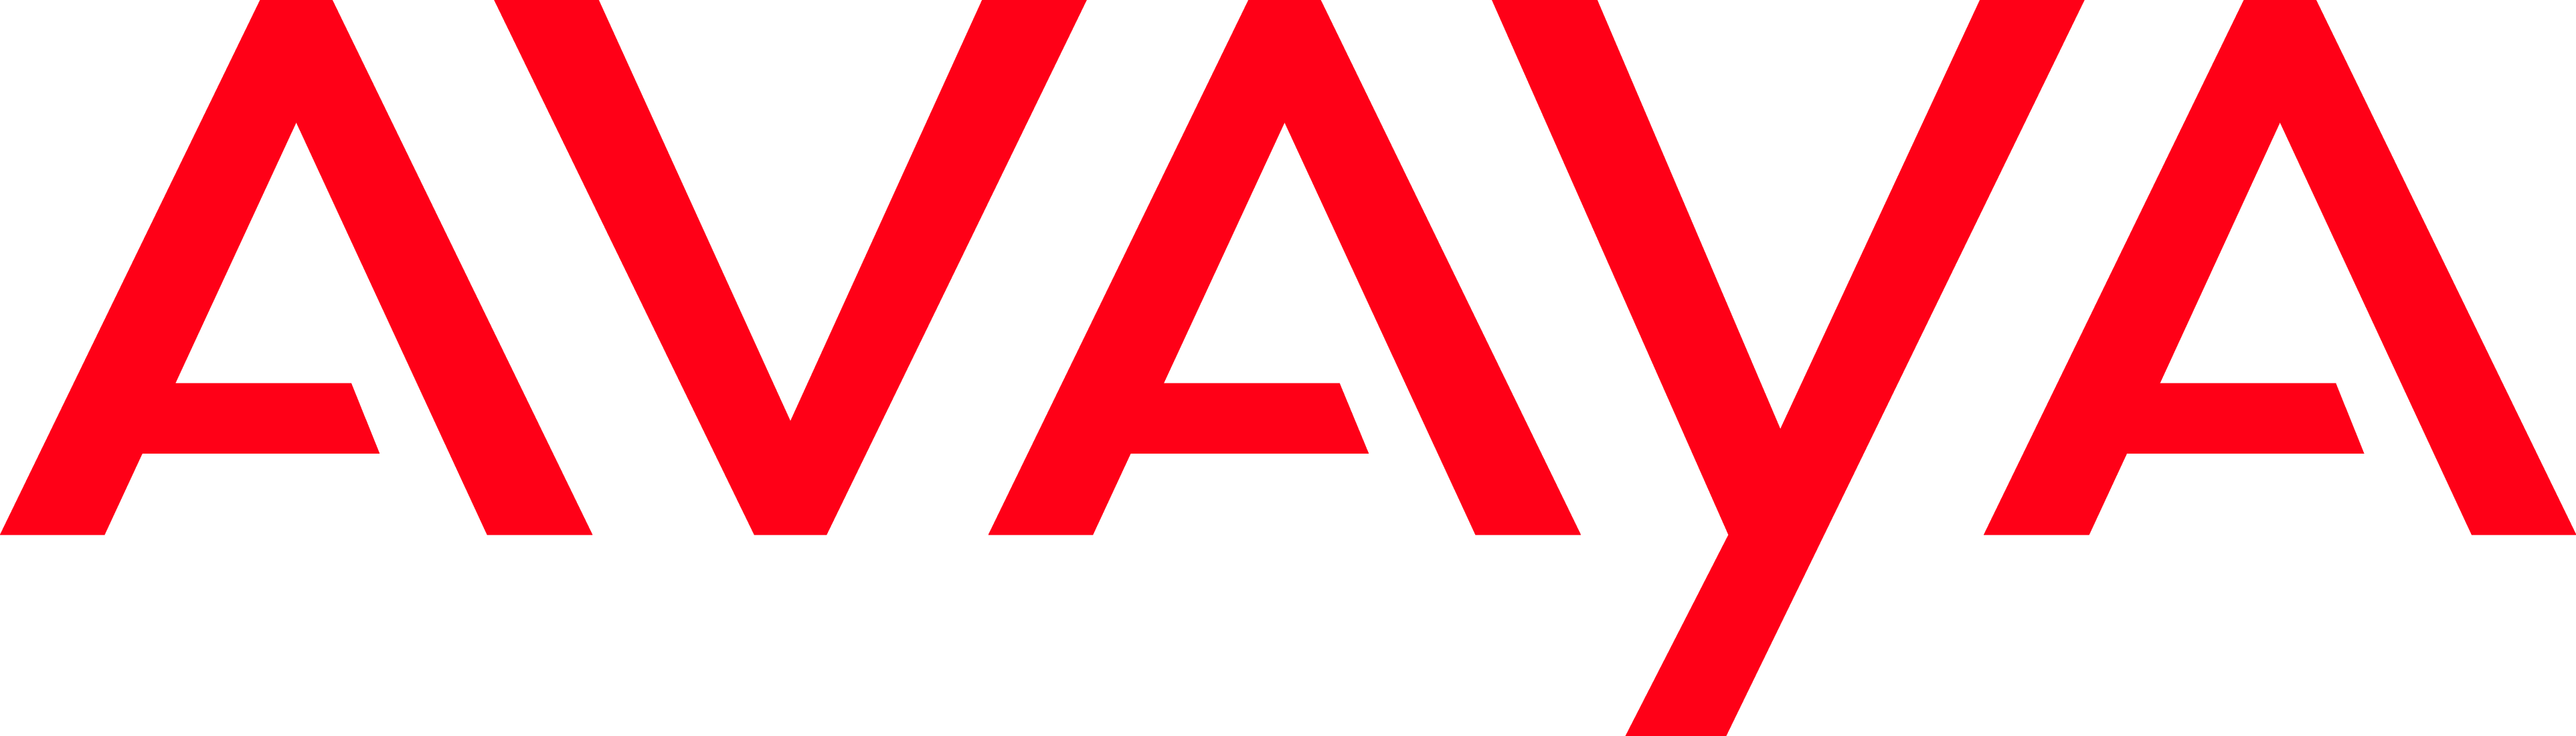 Avaya Logo Vector EPS Free Download, Logo, Icons, Brand Emblems